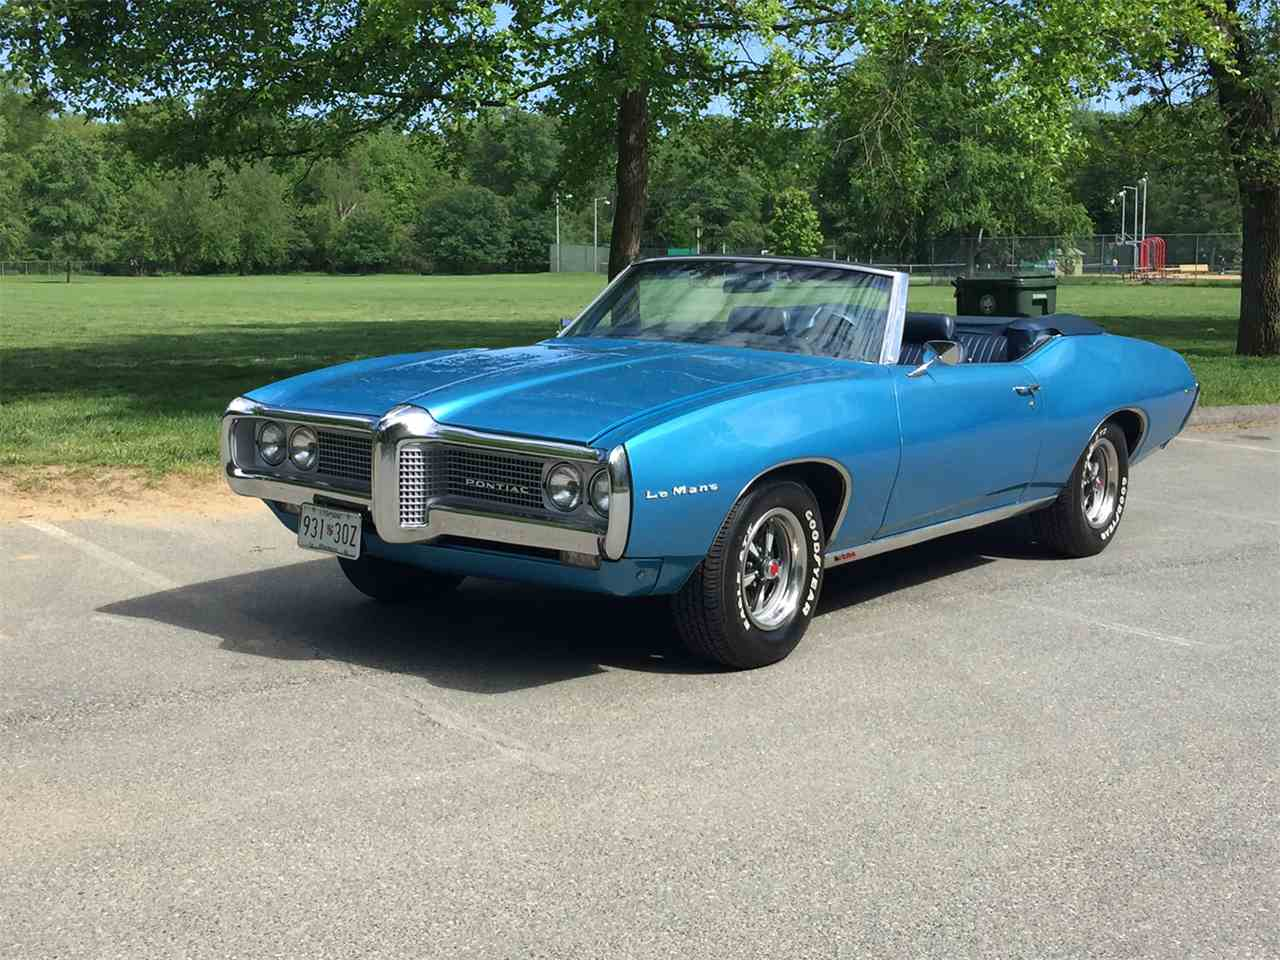 Pontiac LeMans III 1968 - 1972 Cabriolet #1